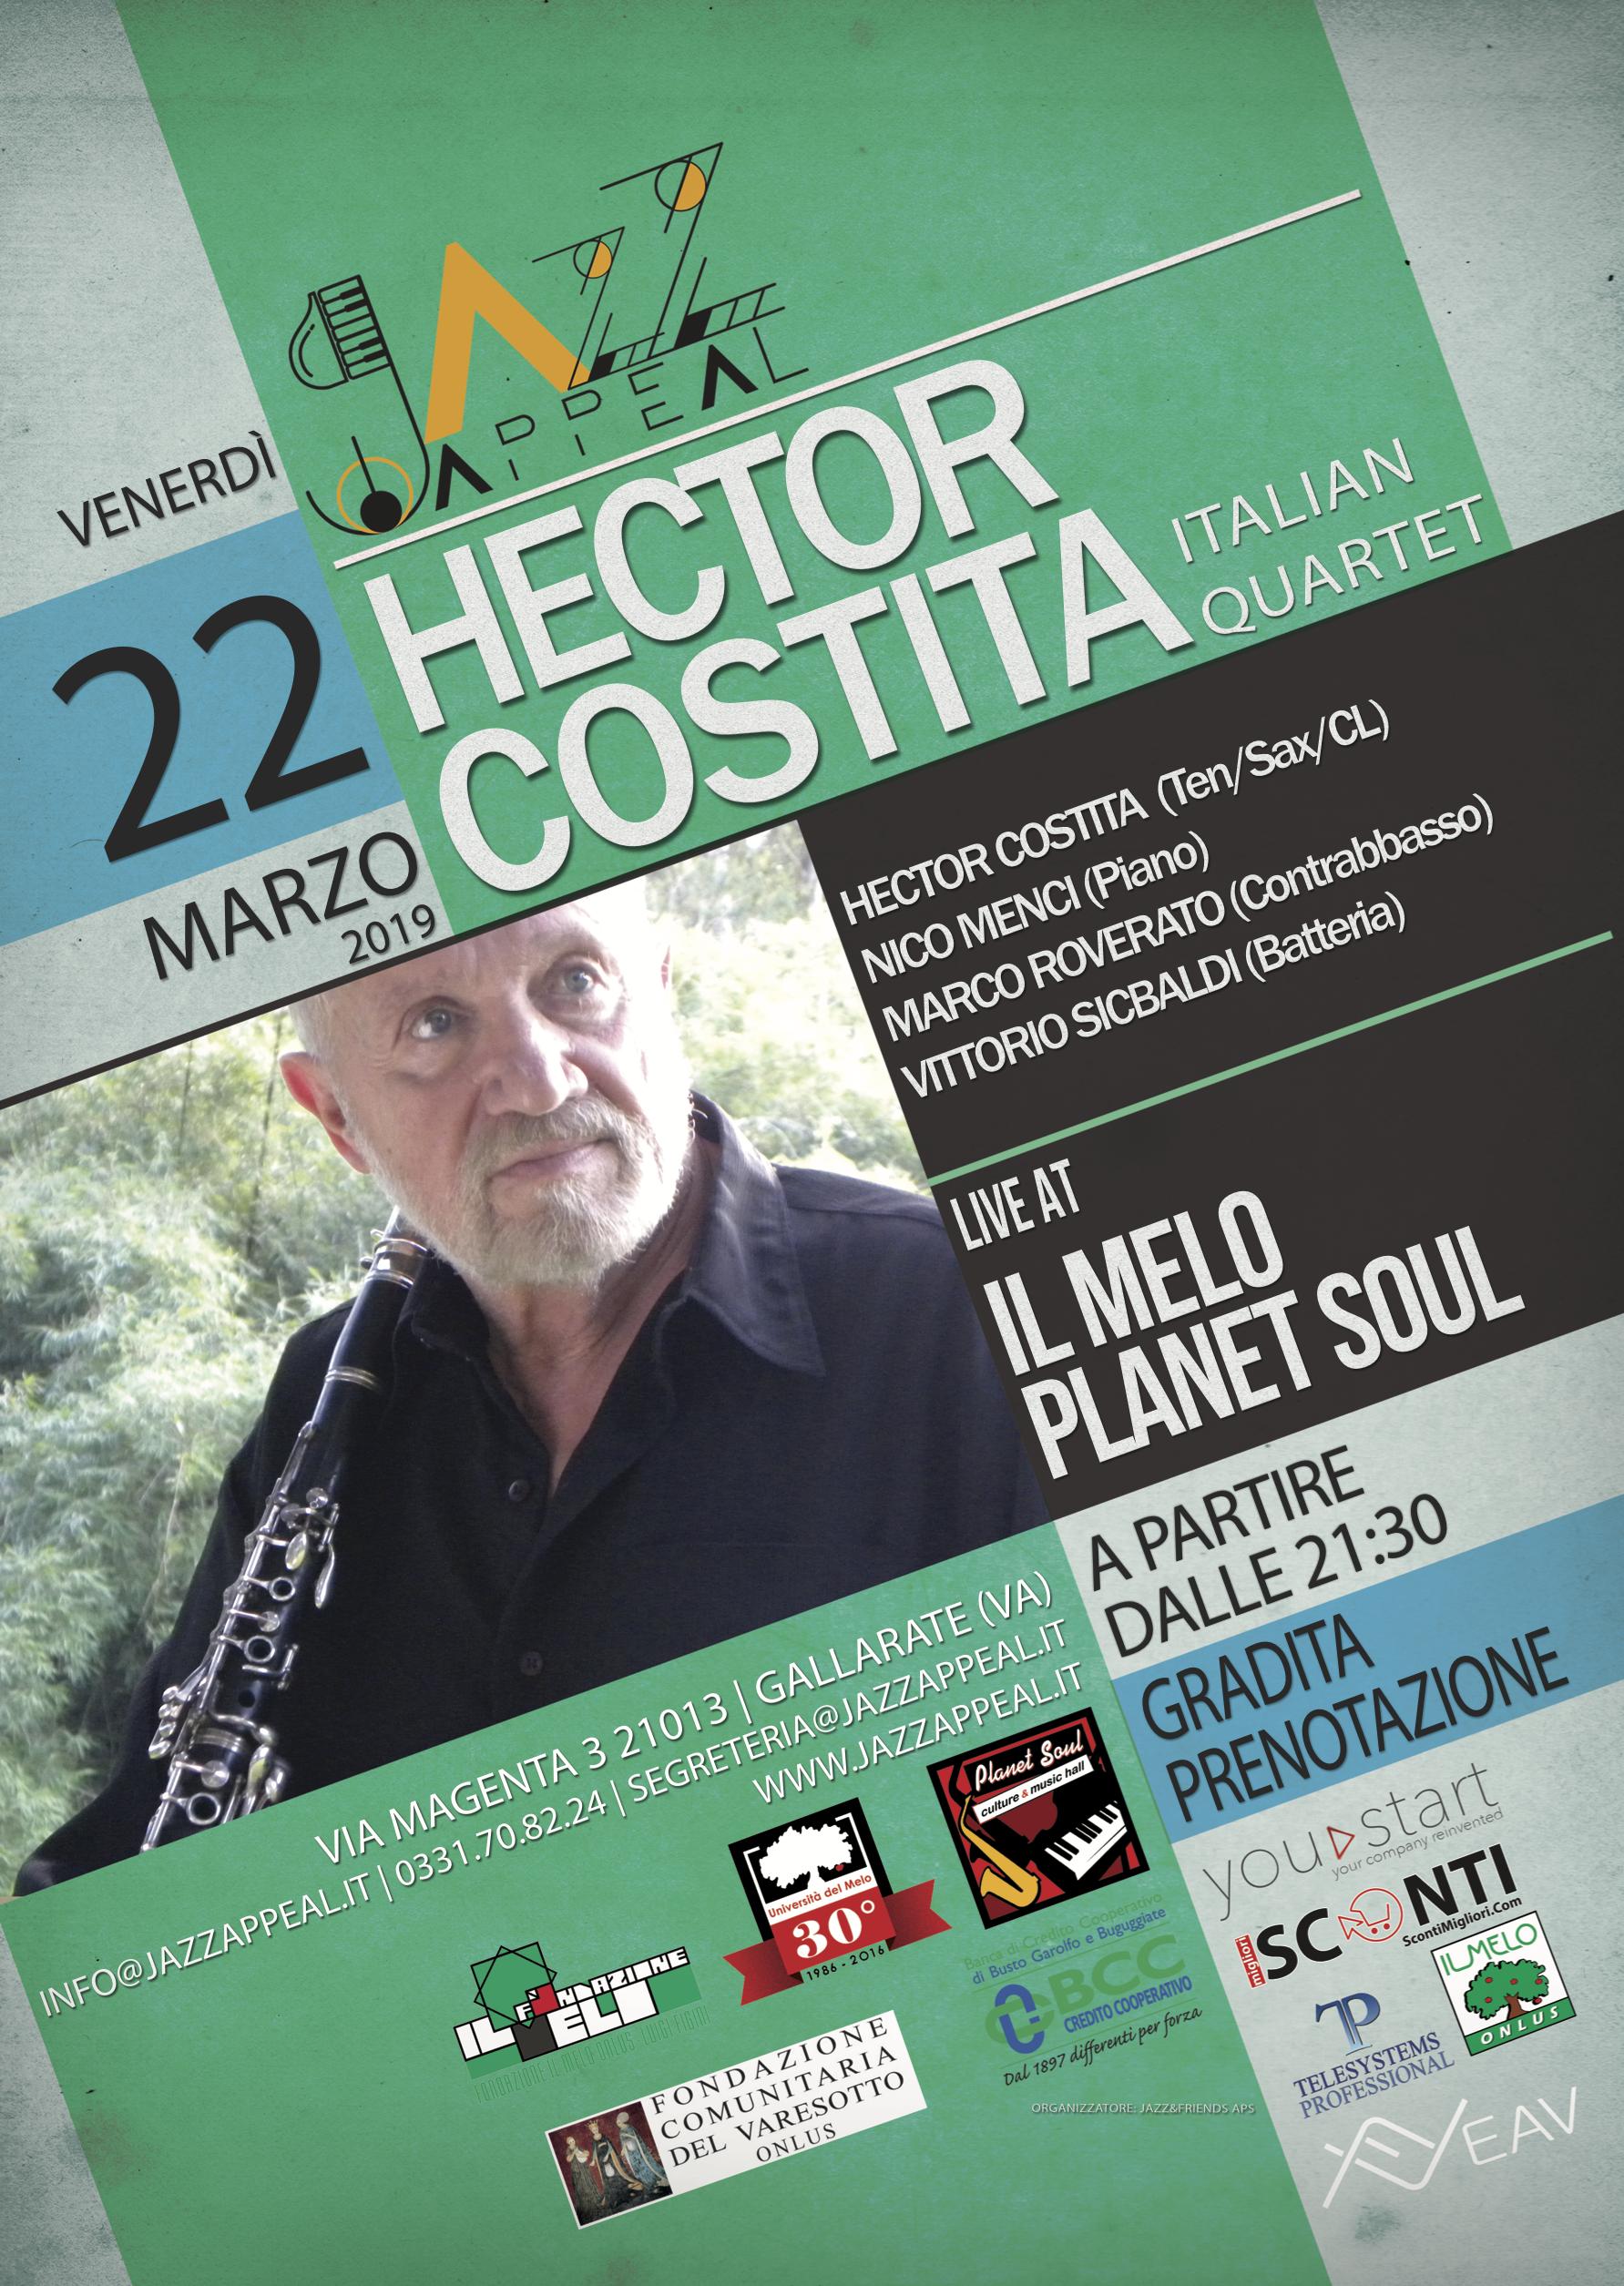 Jazz Appeal Gallarate - Hector Costita